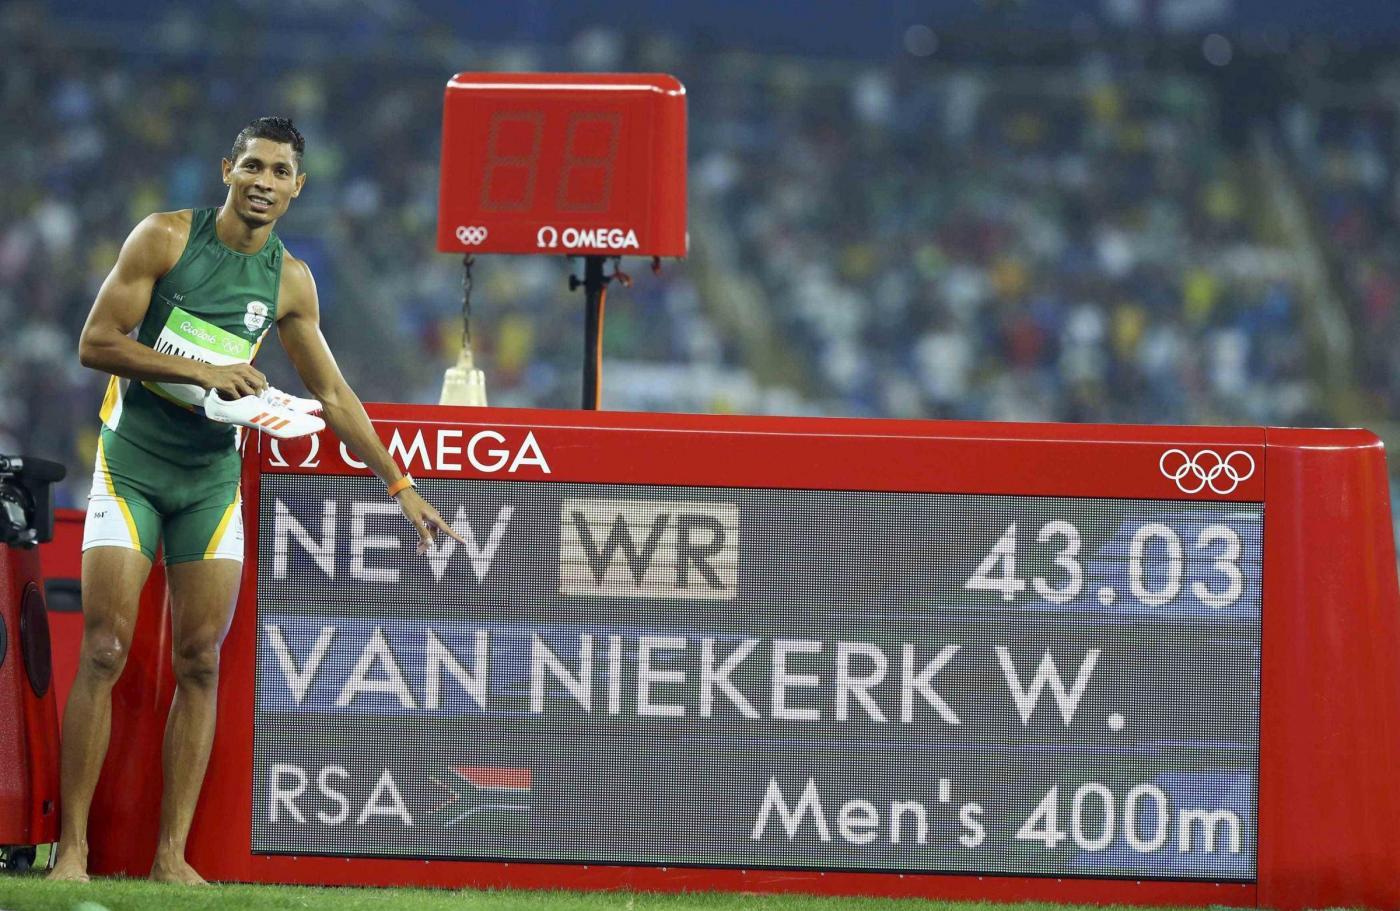 Atletica, Wayde van Niekerk oro e recordo del mondo nei 400m